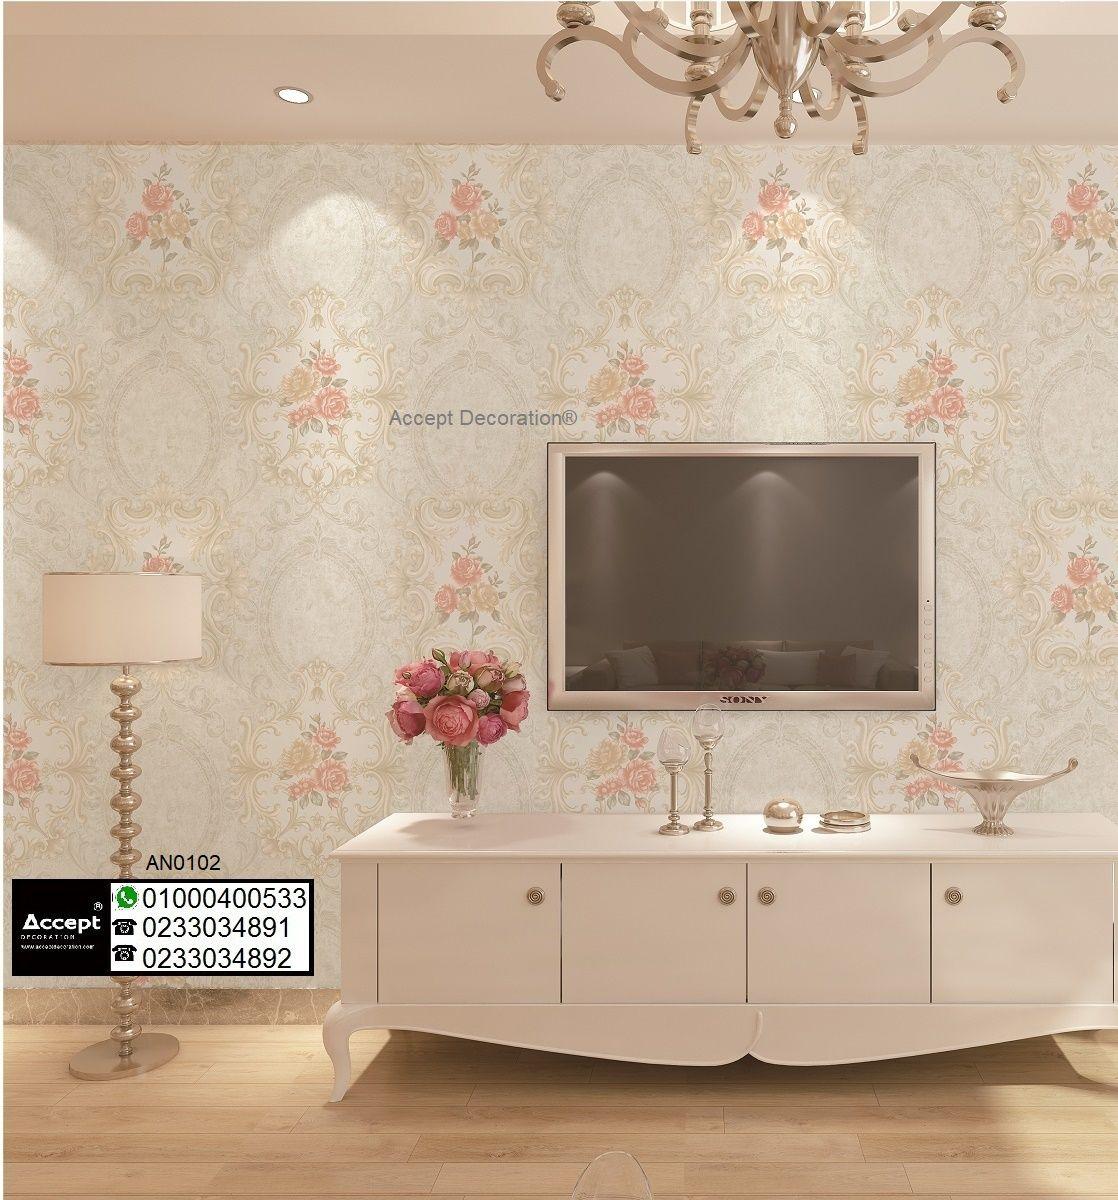 ورق جدران مودرن ورق الجدرن ورق حائط غرف النوم Feature Wall Living Room Girls Bedroom Furniture Dining Room Interiors